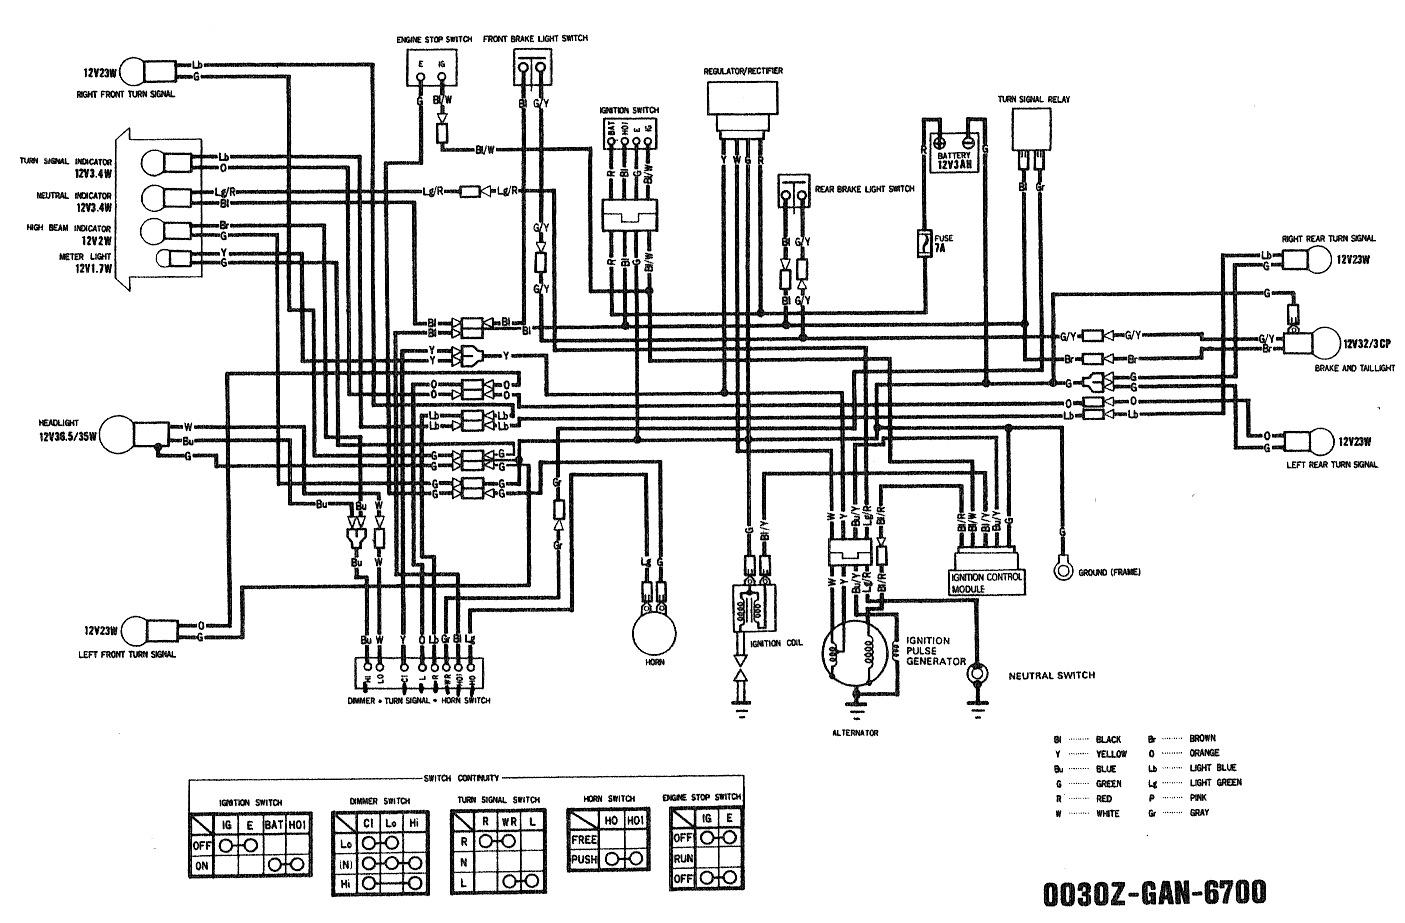 70 Volt Speaker Wiring Diagram Additionally 24v Trolling